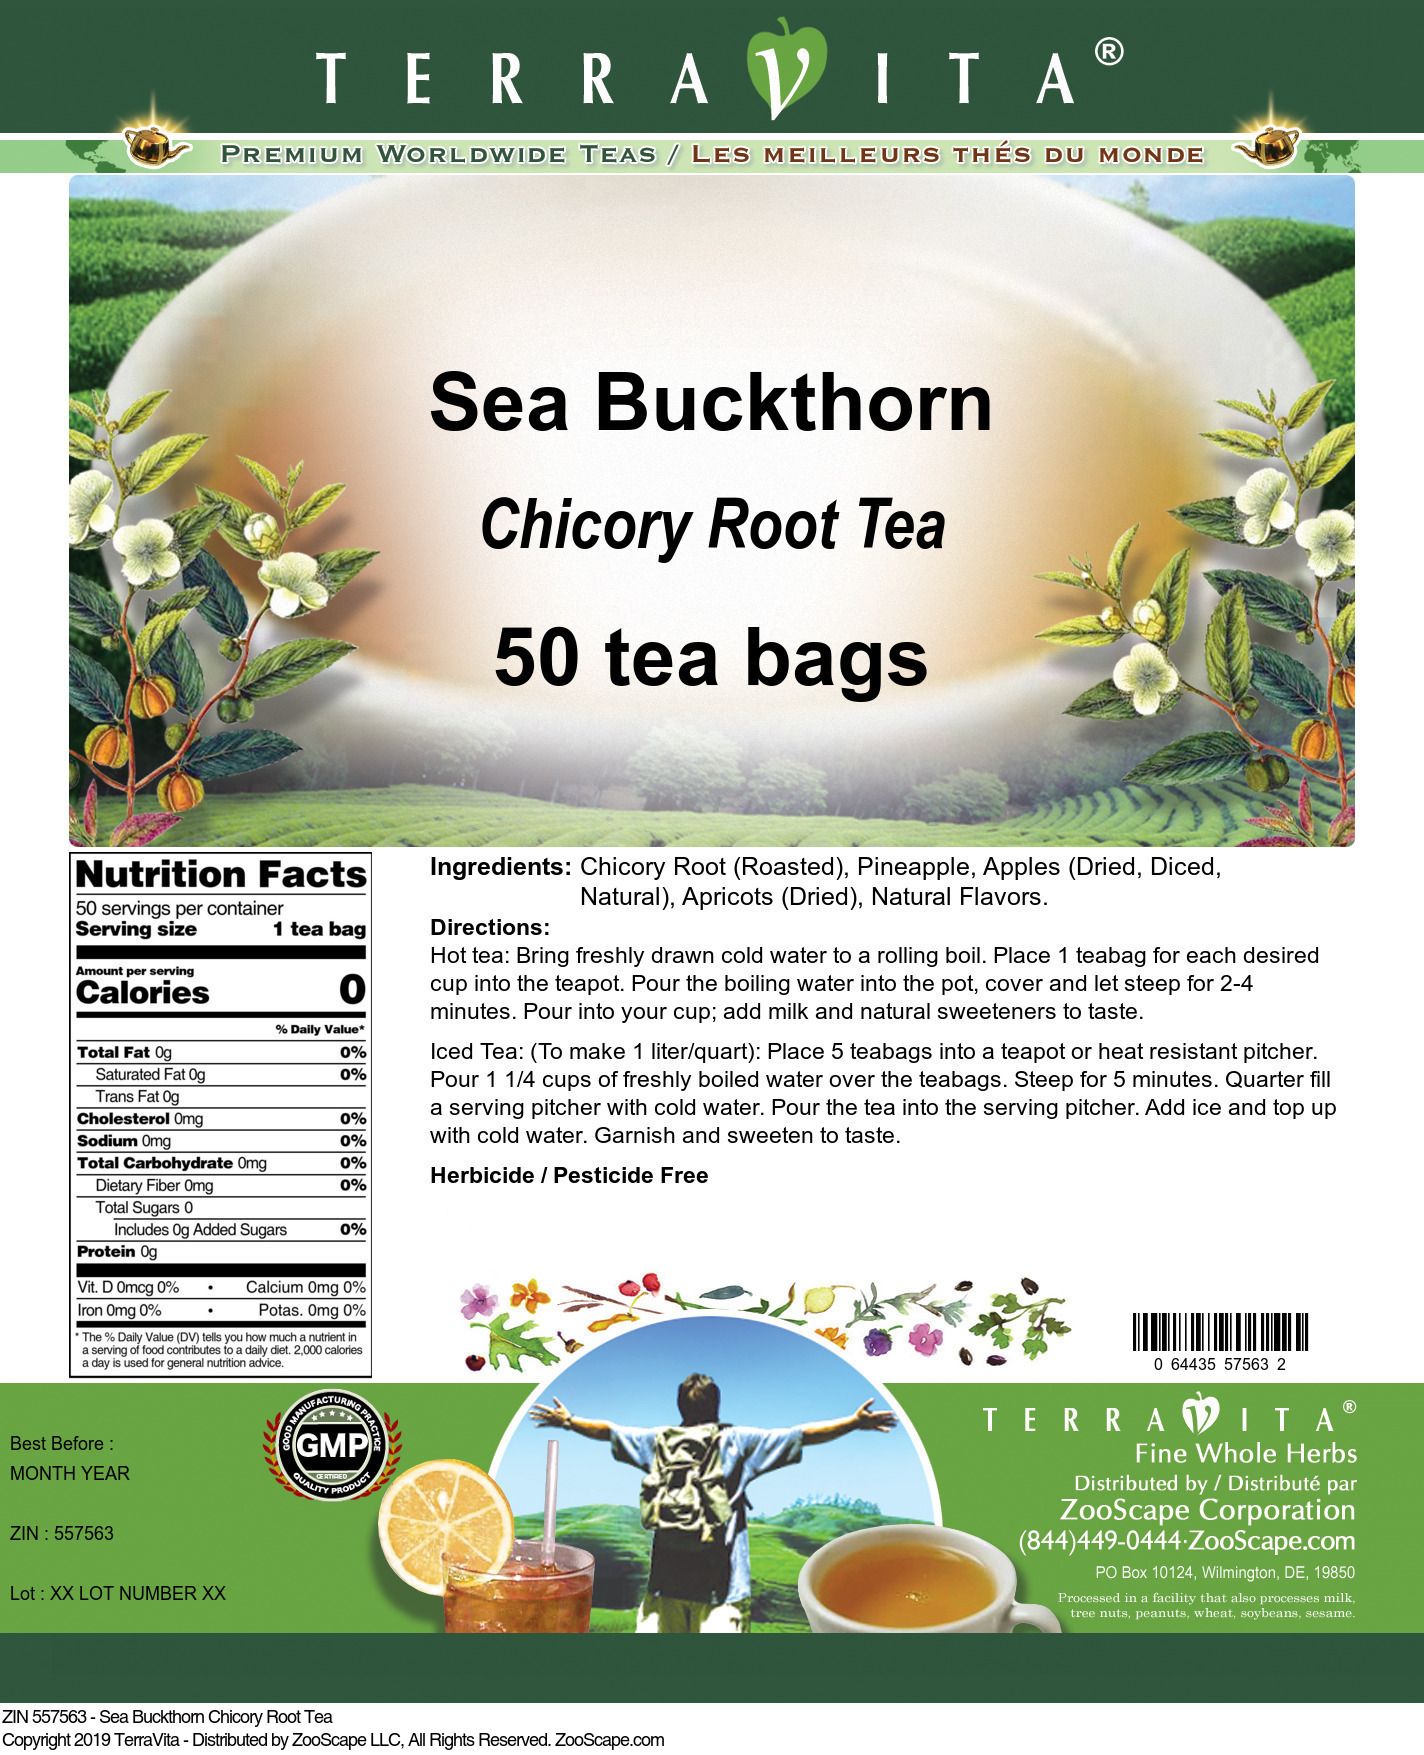 Sea Buckthorn Chicory Root Tea